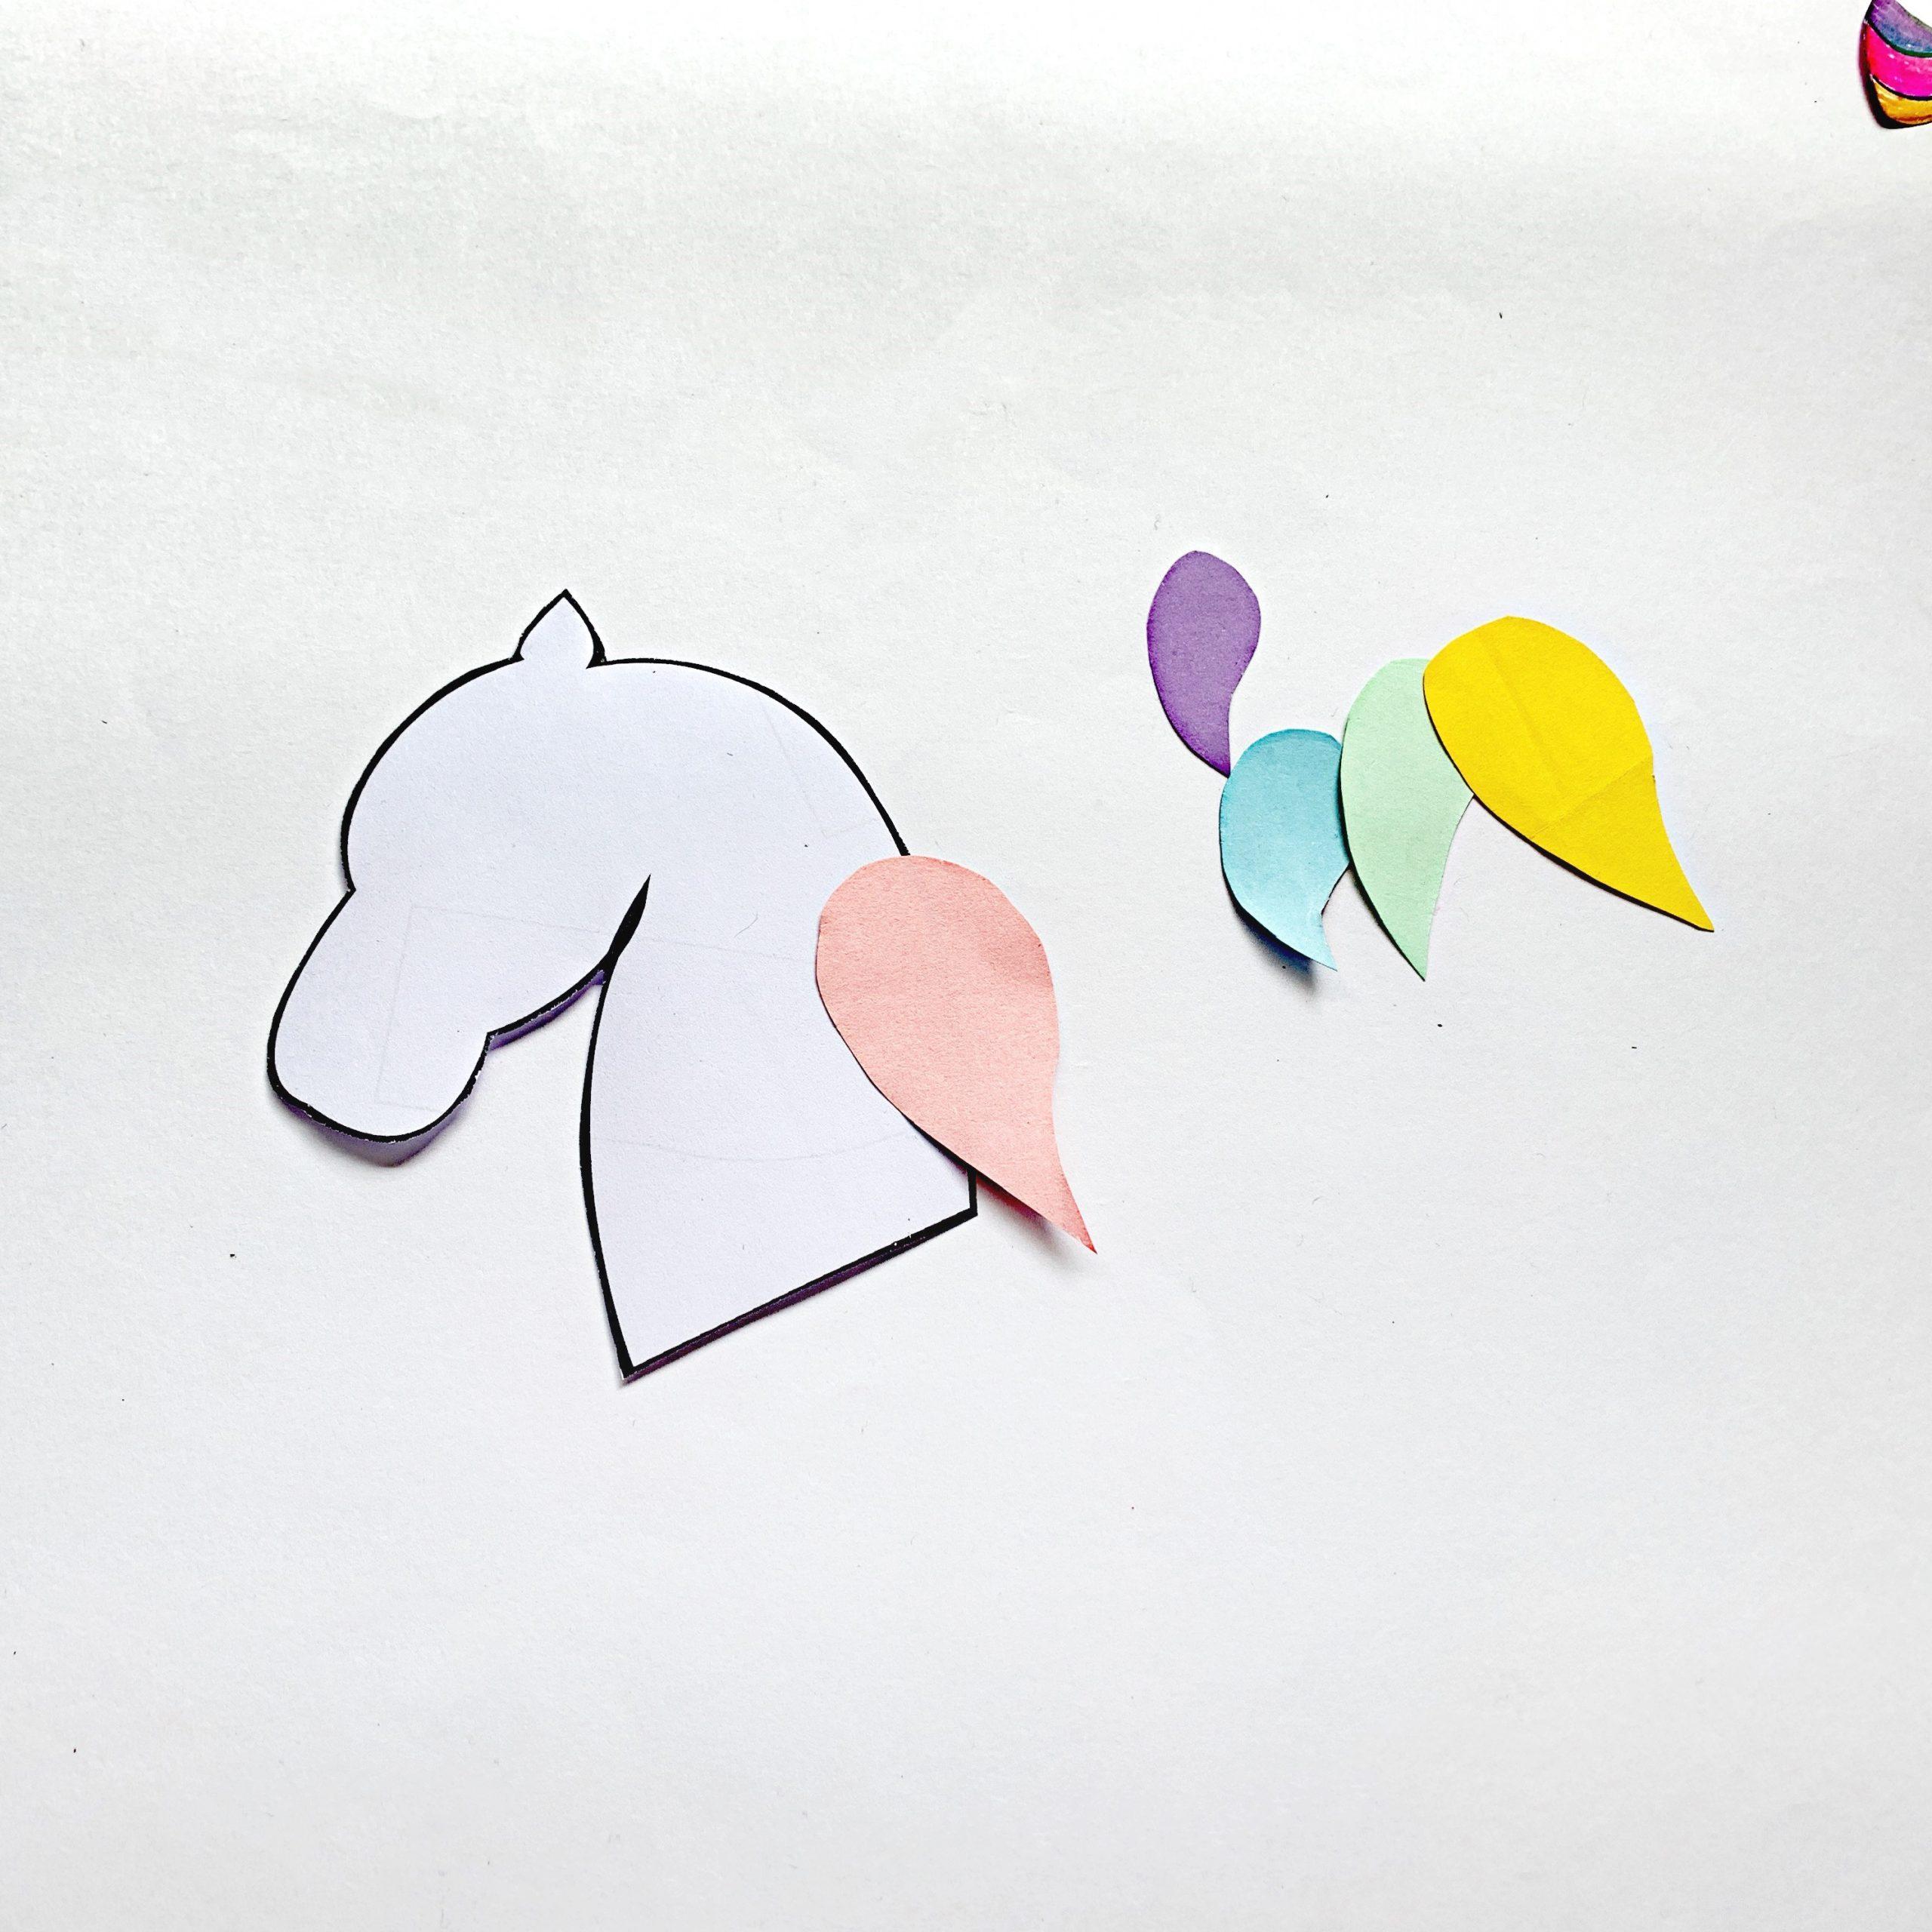 unicorn bookmark step by step